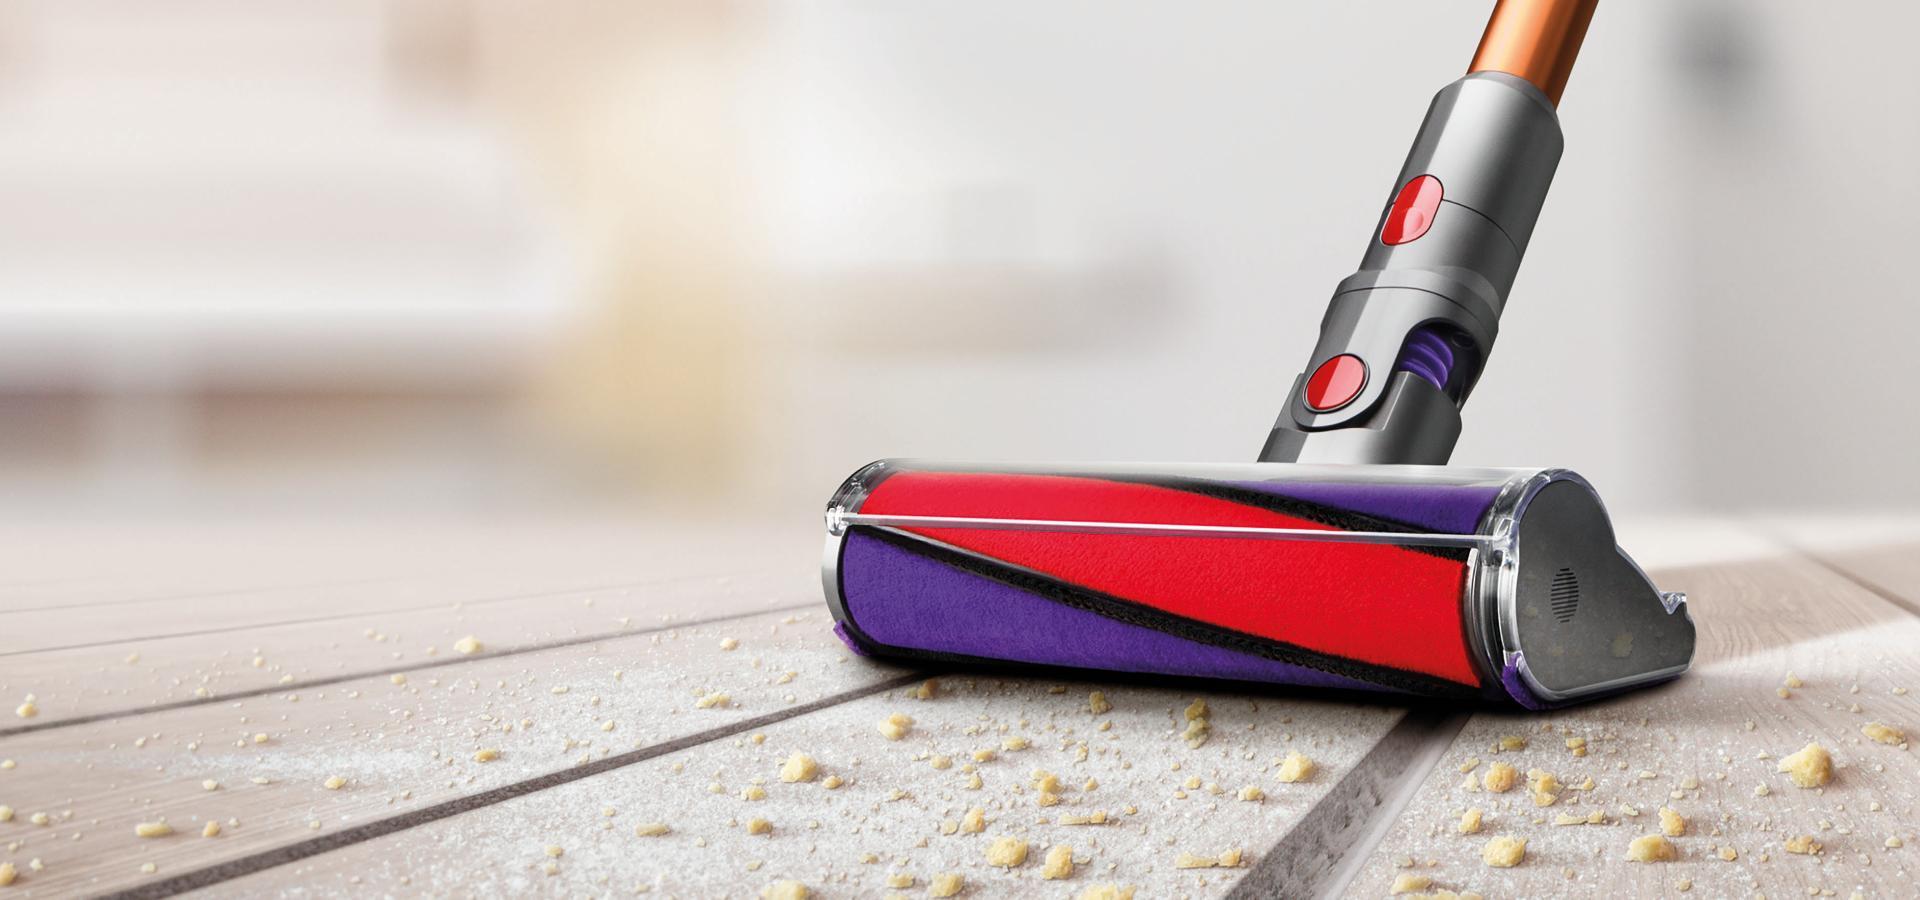 Soft roller cleaner head on hard floor